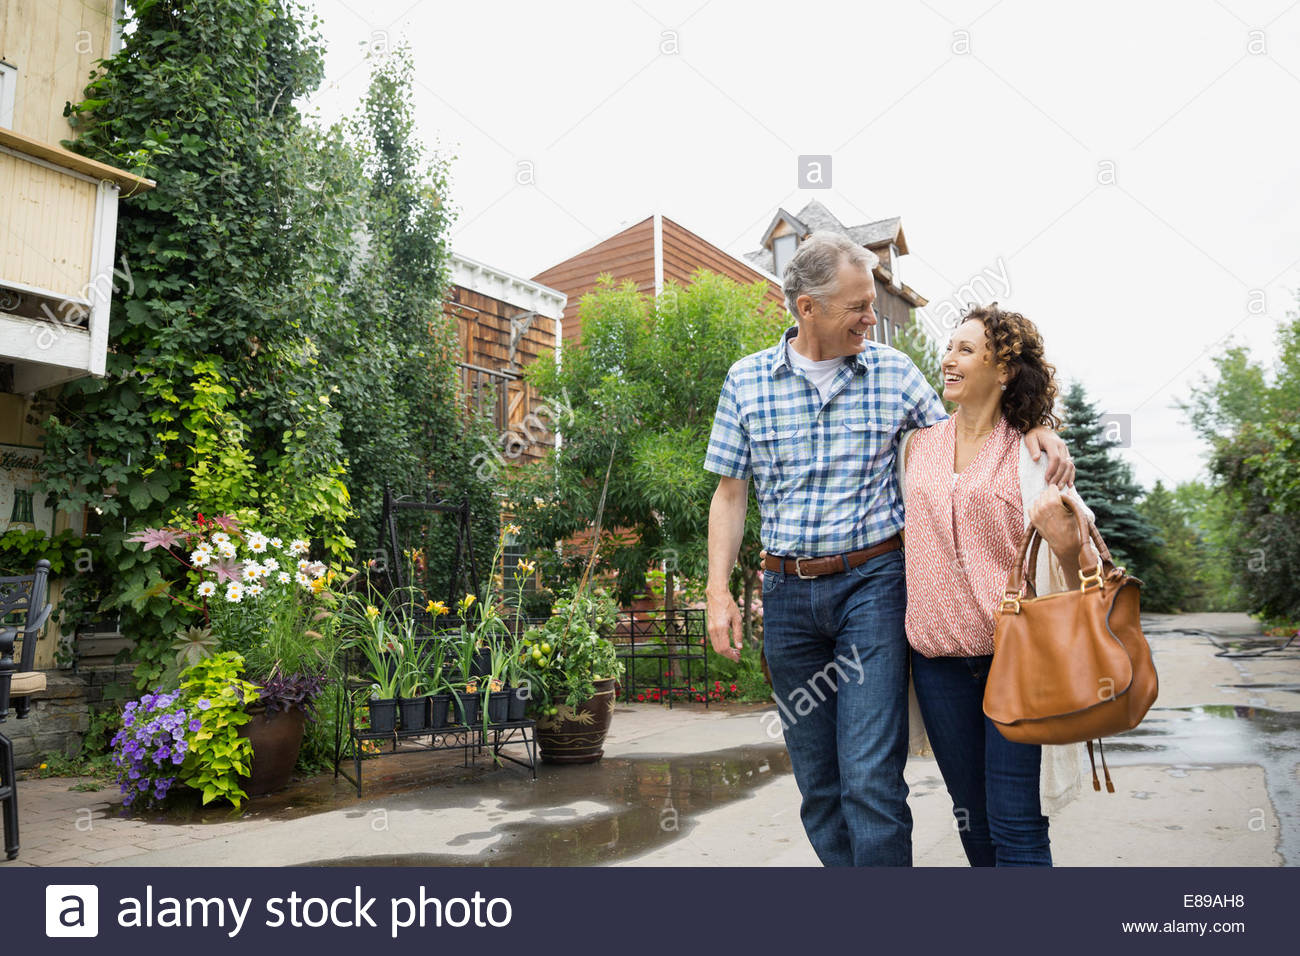 Couple walking outside plant nursery - Stock Image